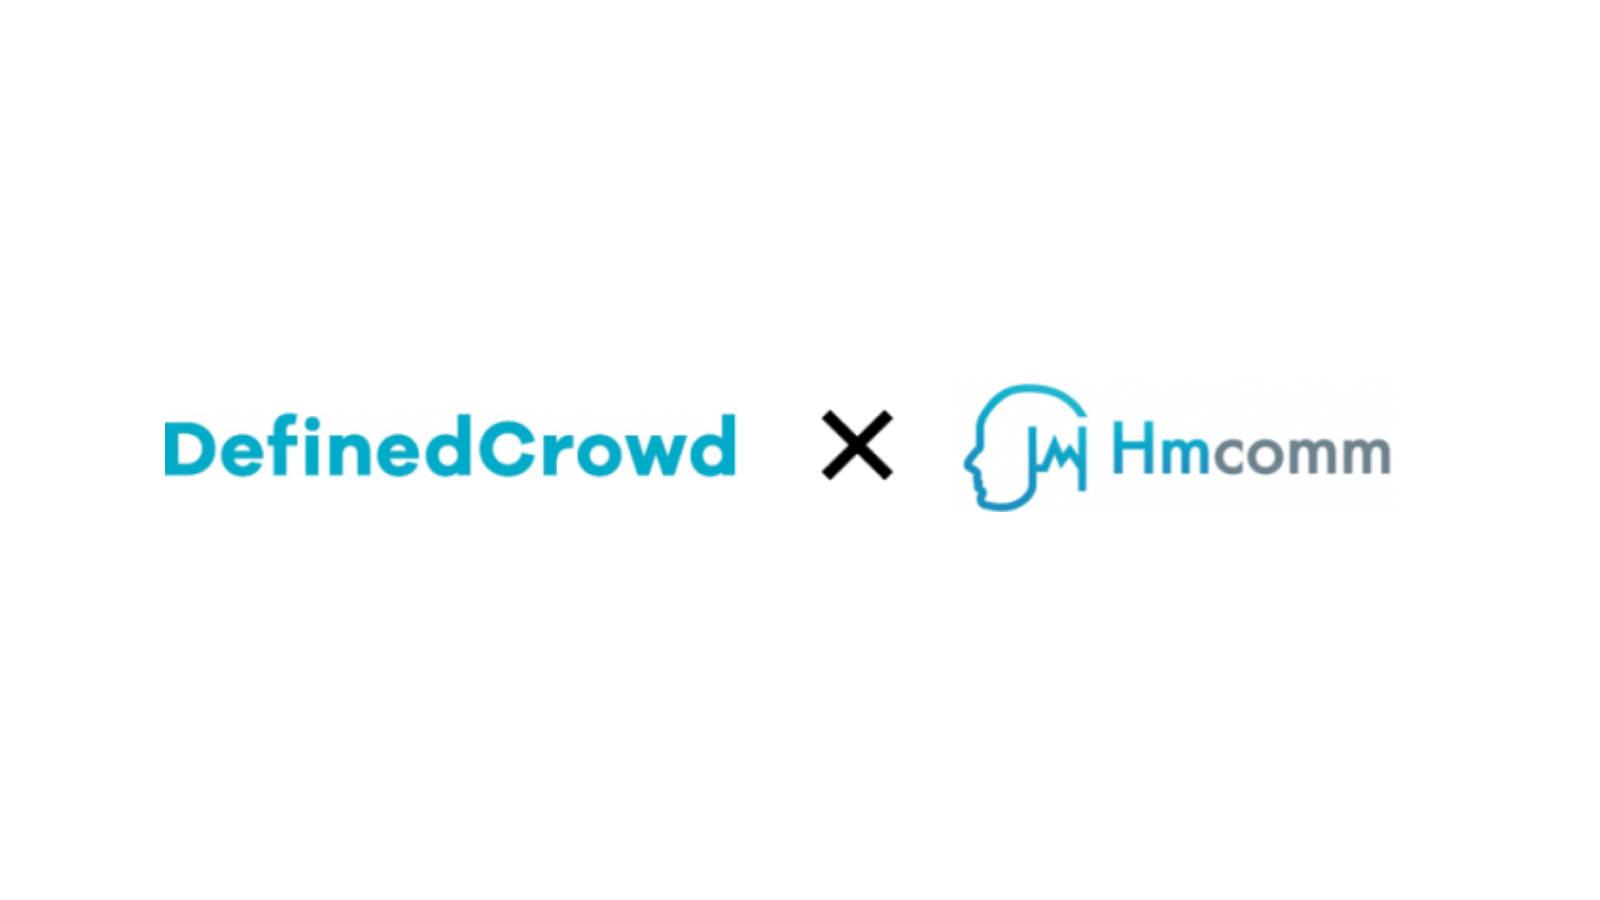 Hmcomm×DefinedCrowd|AIによる音声と感情のデータアノテーション領域で、戦略的パートナーシップを締結